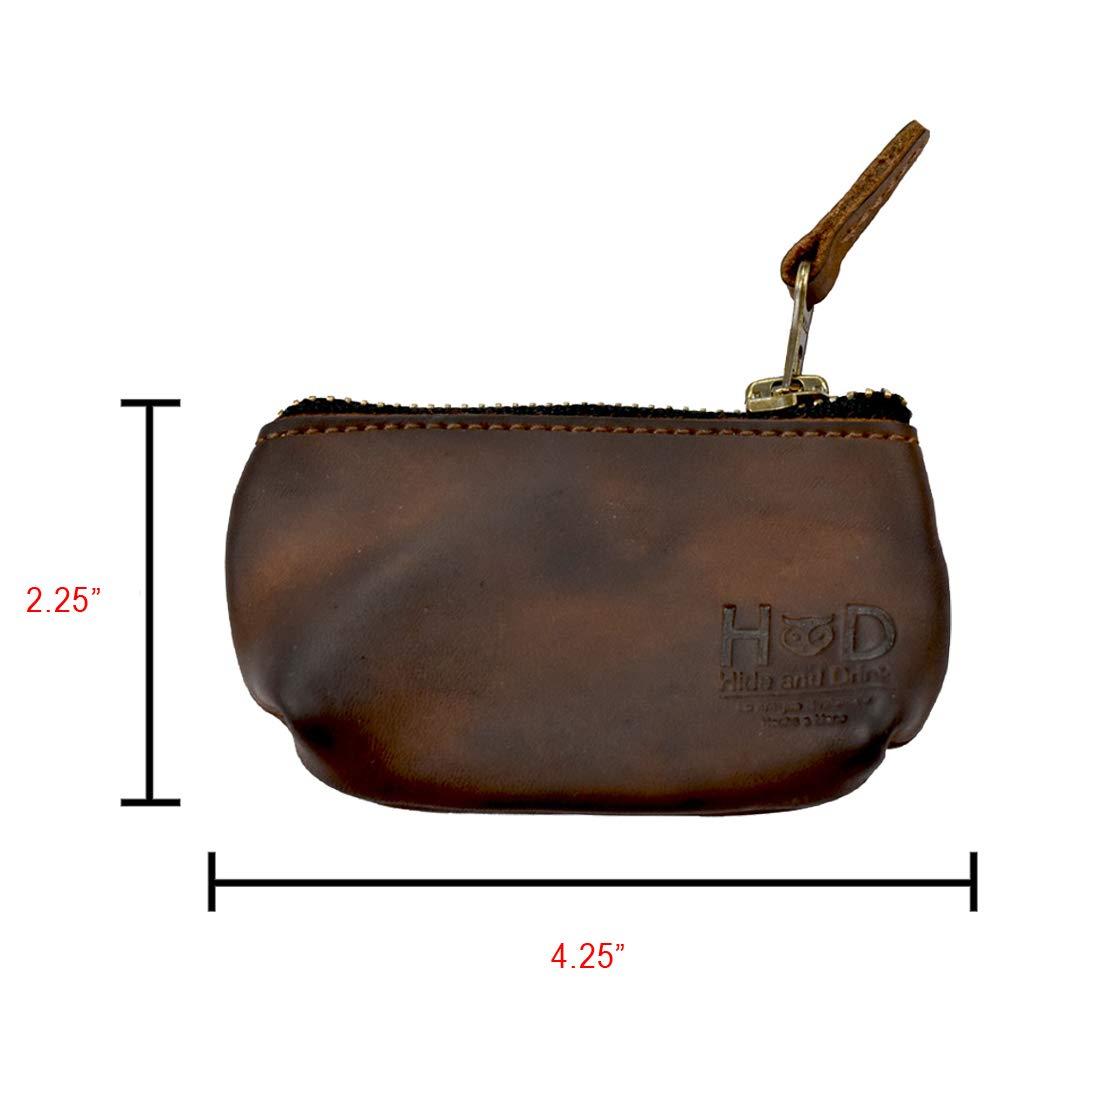 Secret Stash Handmade Includes 101 Year Warranty Bourbon Brown Hide /& Drink Rustic Leather Tampon Case//Condom Holder Pouch